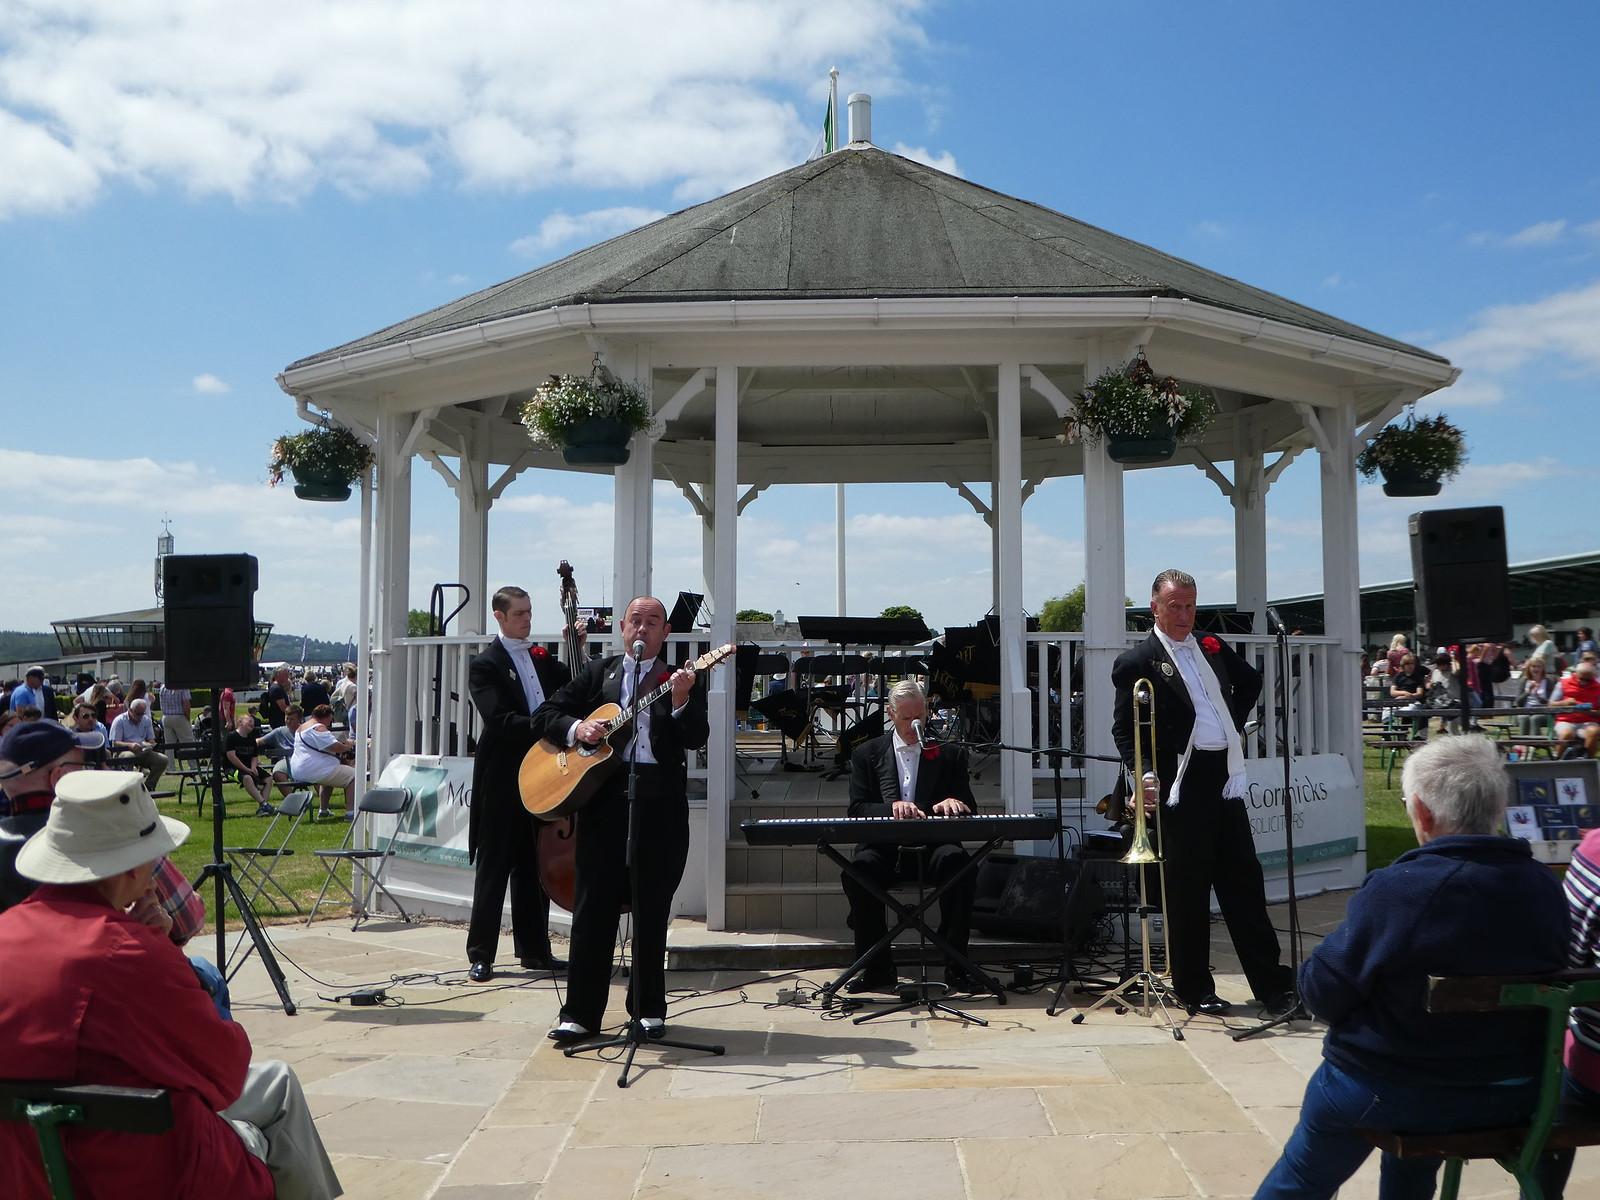 Great Yorkshire Show, Harrogate